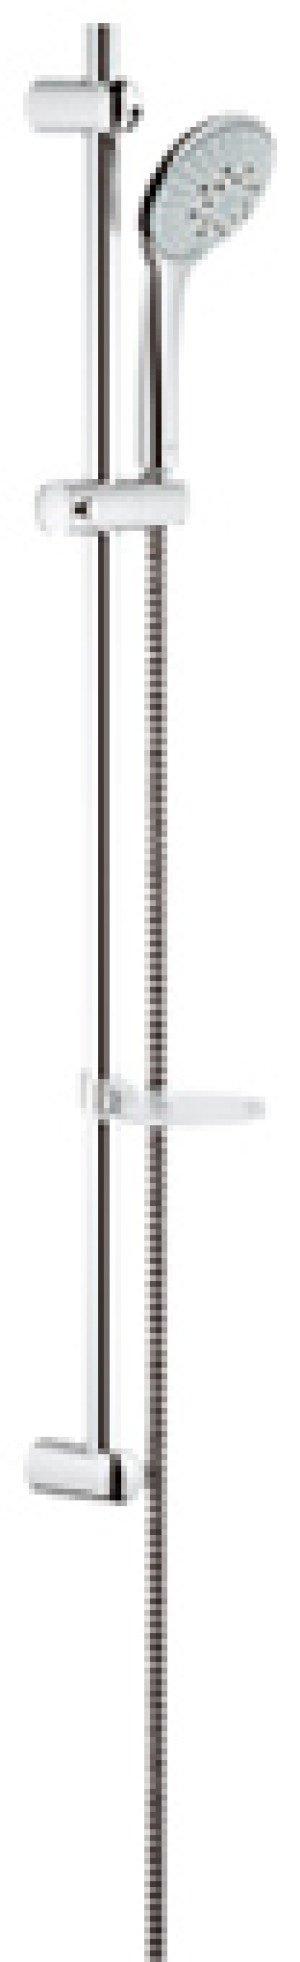 Grohe Euphoria glijstangset 90cm - 27227001